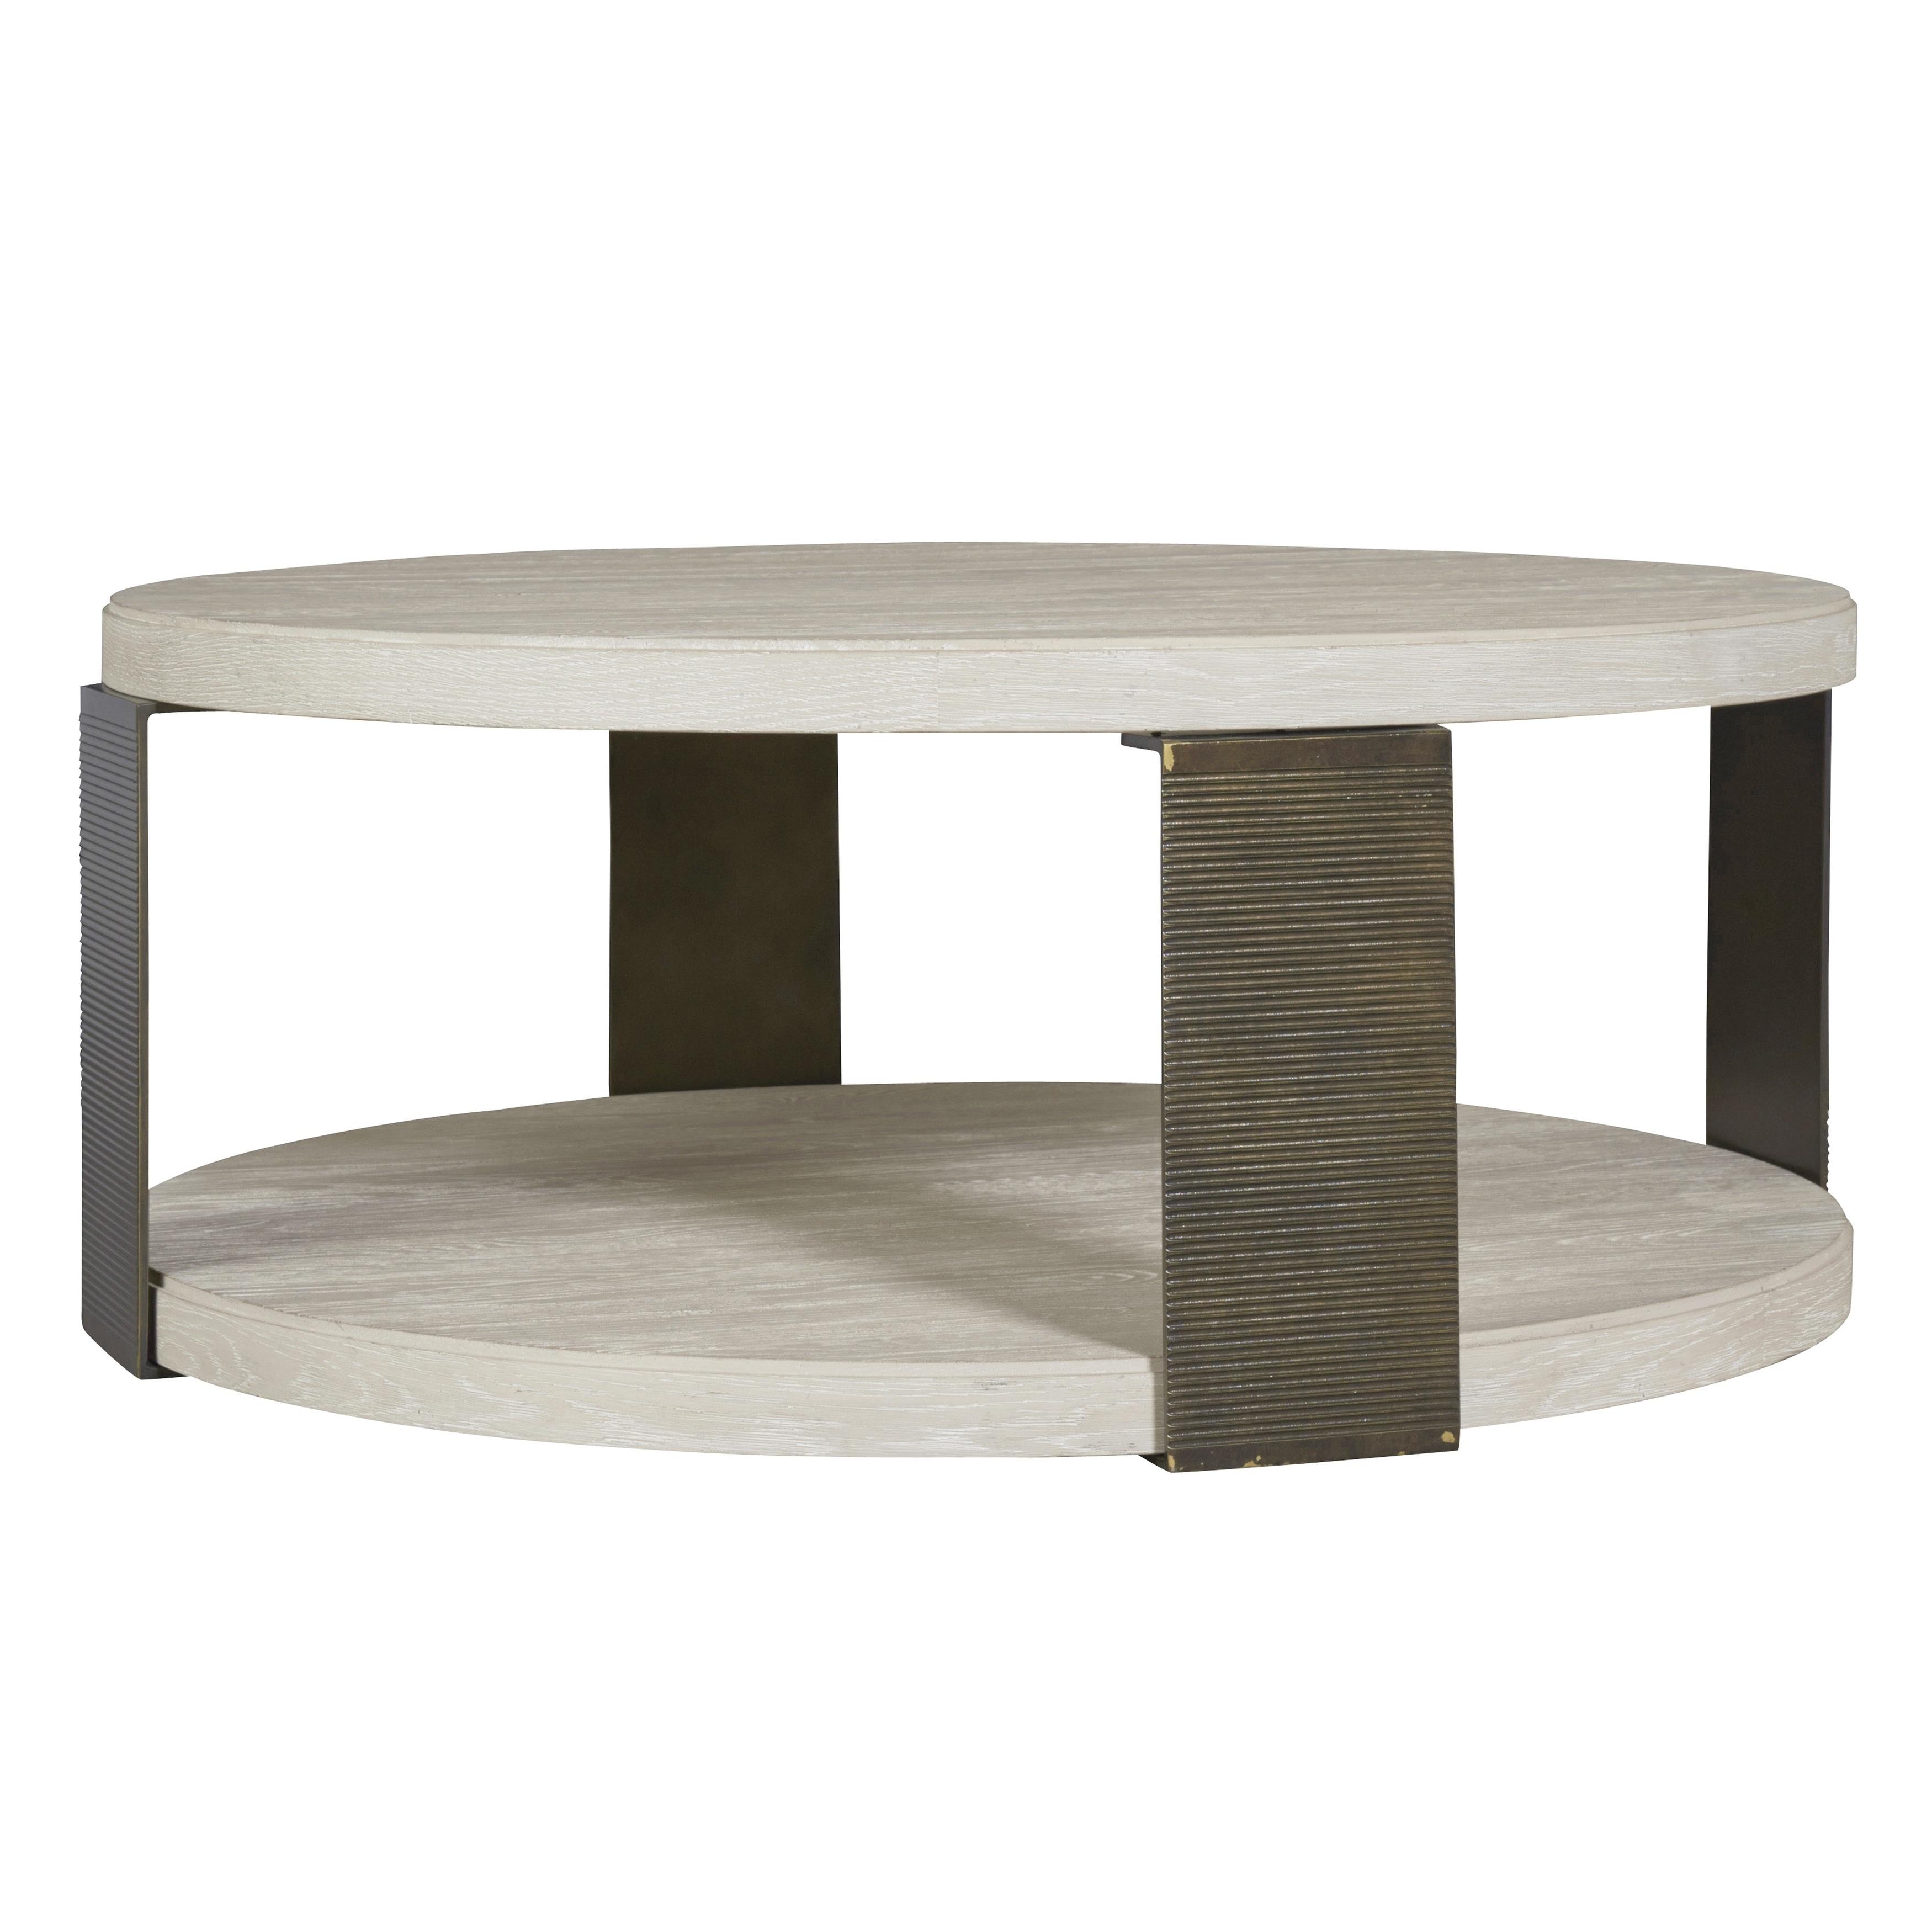 Shop Black Friday Deals On Carbon Loft Gene Modern Bronze And Quartz Round Cocktail Table Overstock 18705047